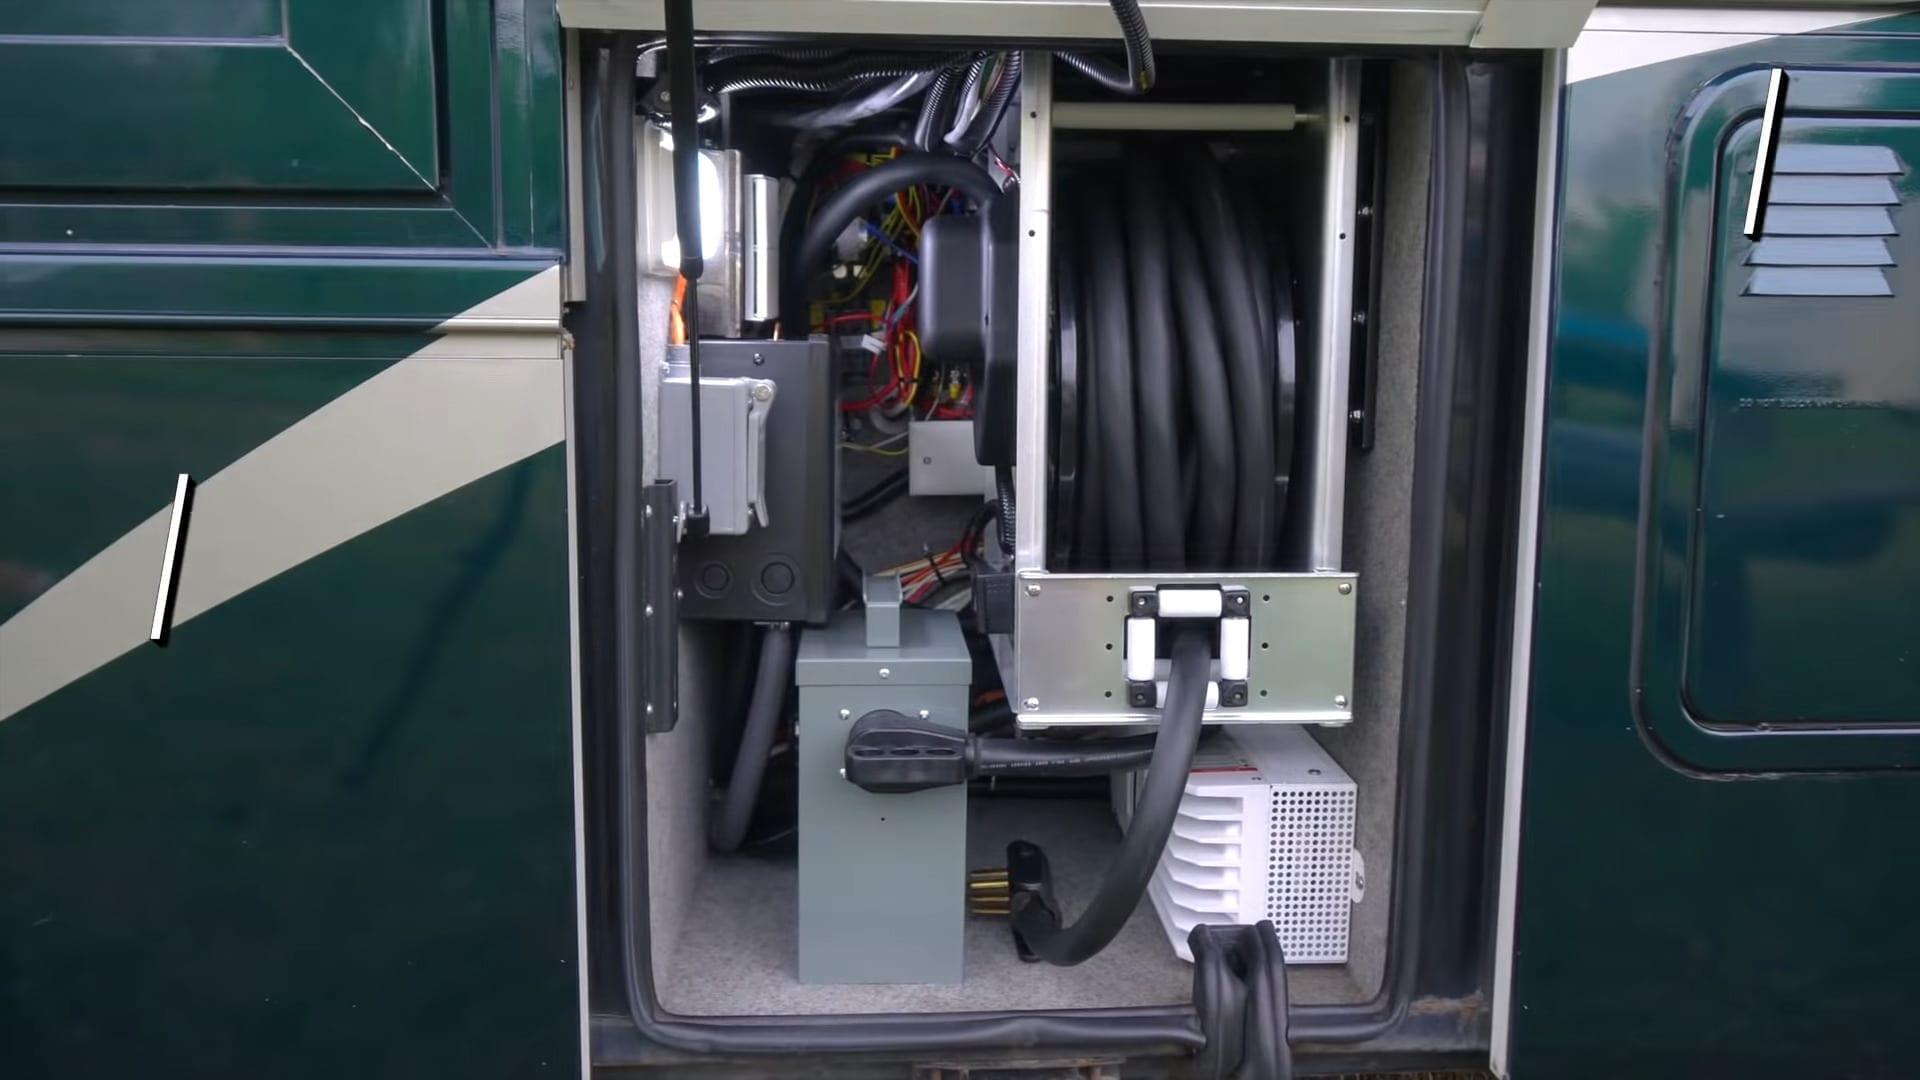 RV power cord